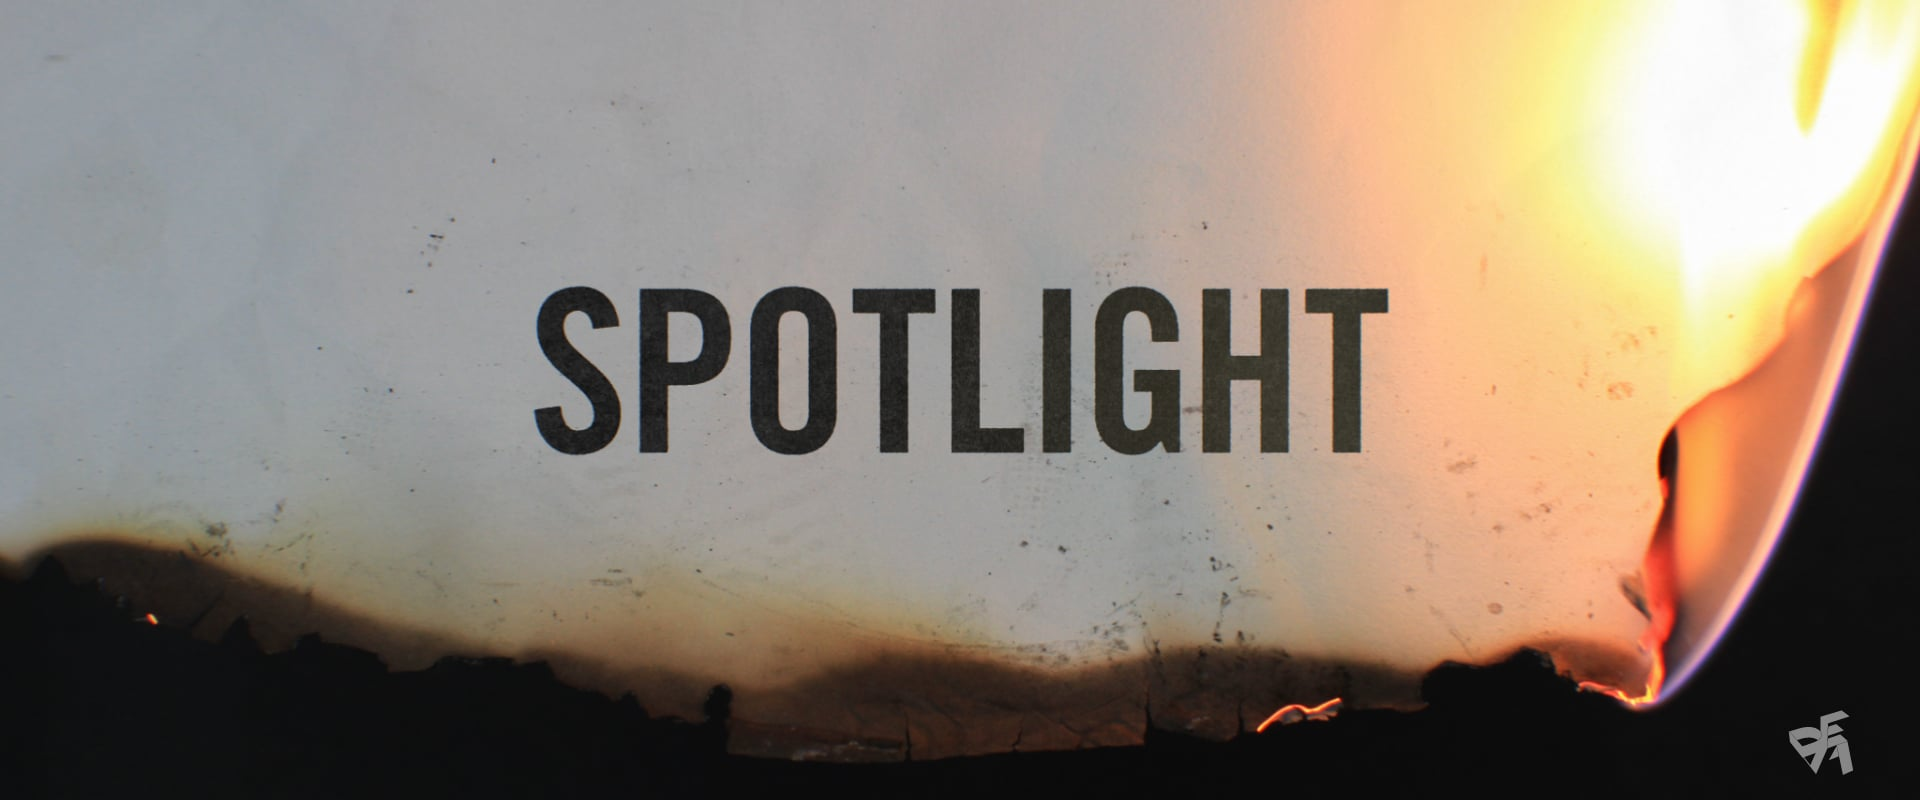 Spotlight-STYLEFRAME_03.jpg